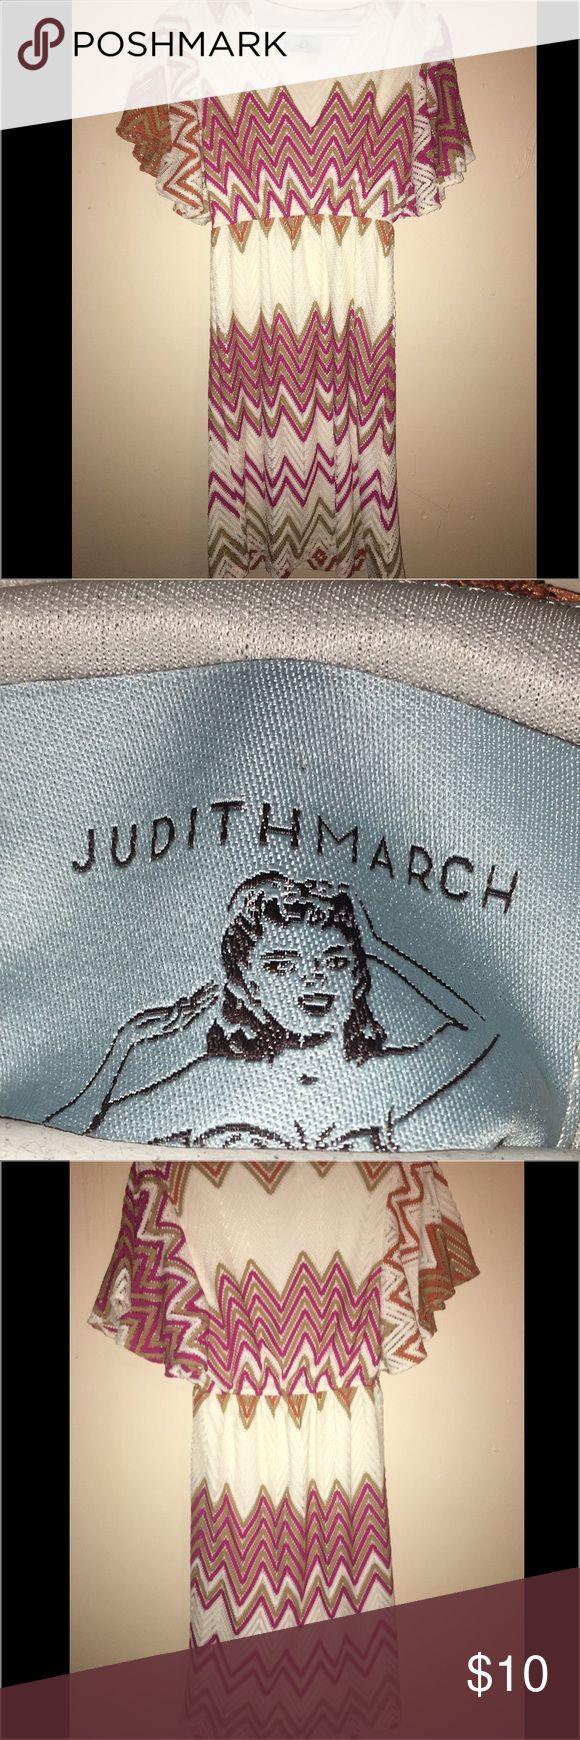 Judith march dress size medium Judith march size medium dress Judith March Dresses Midi